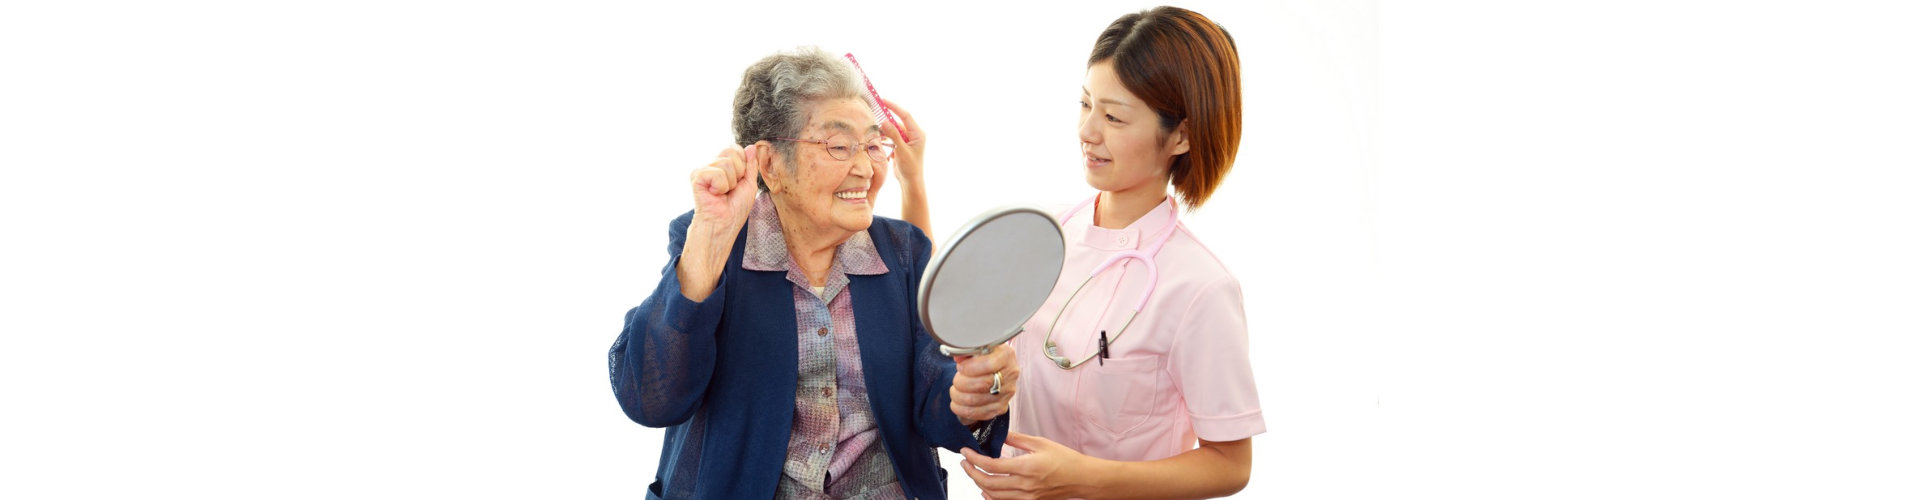 caregiver assisting senior woman taking care of her hai